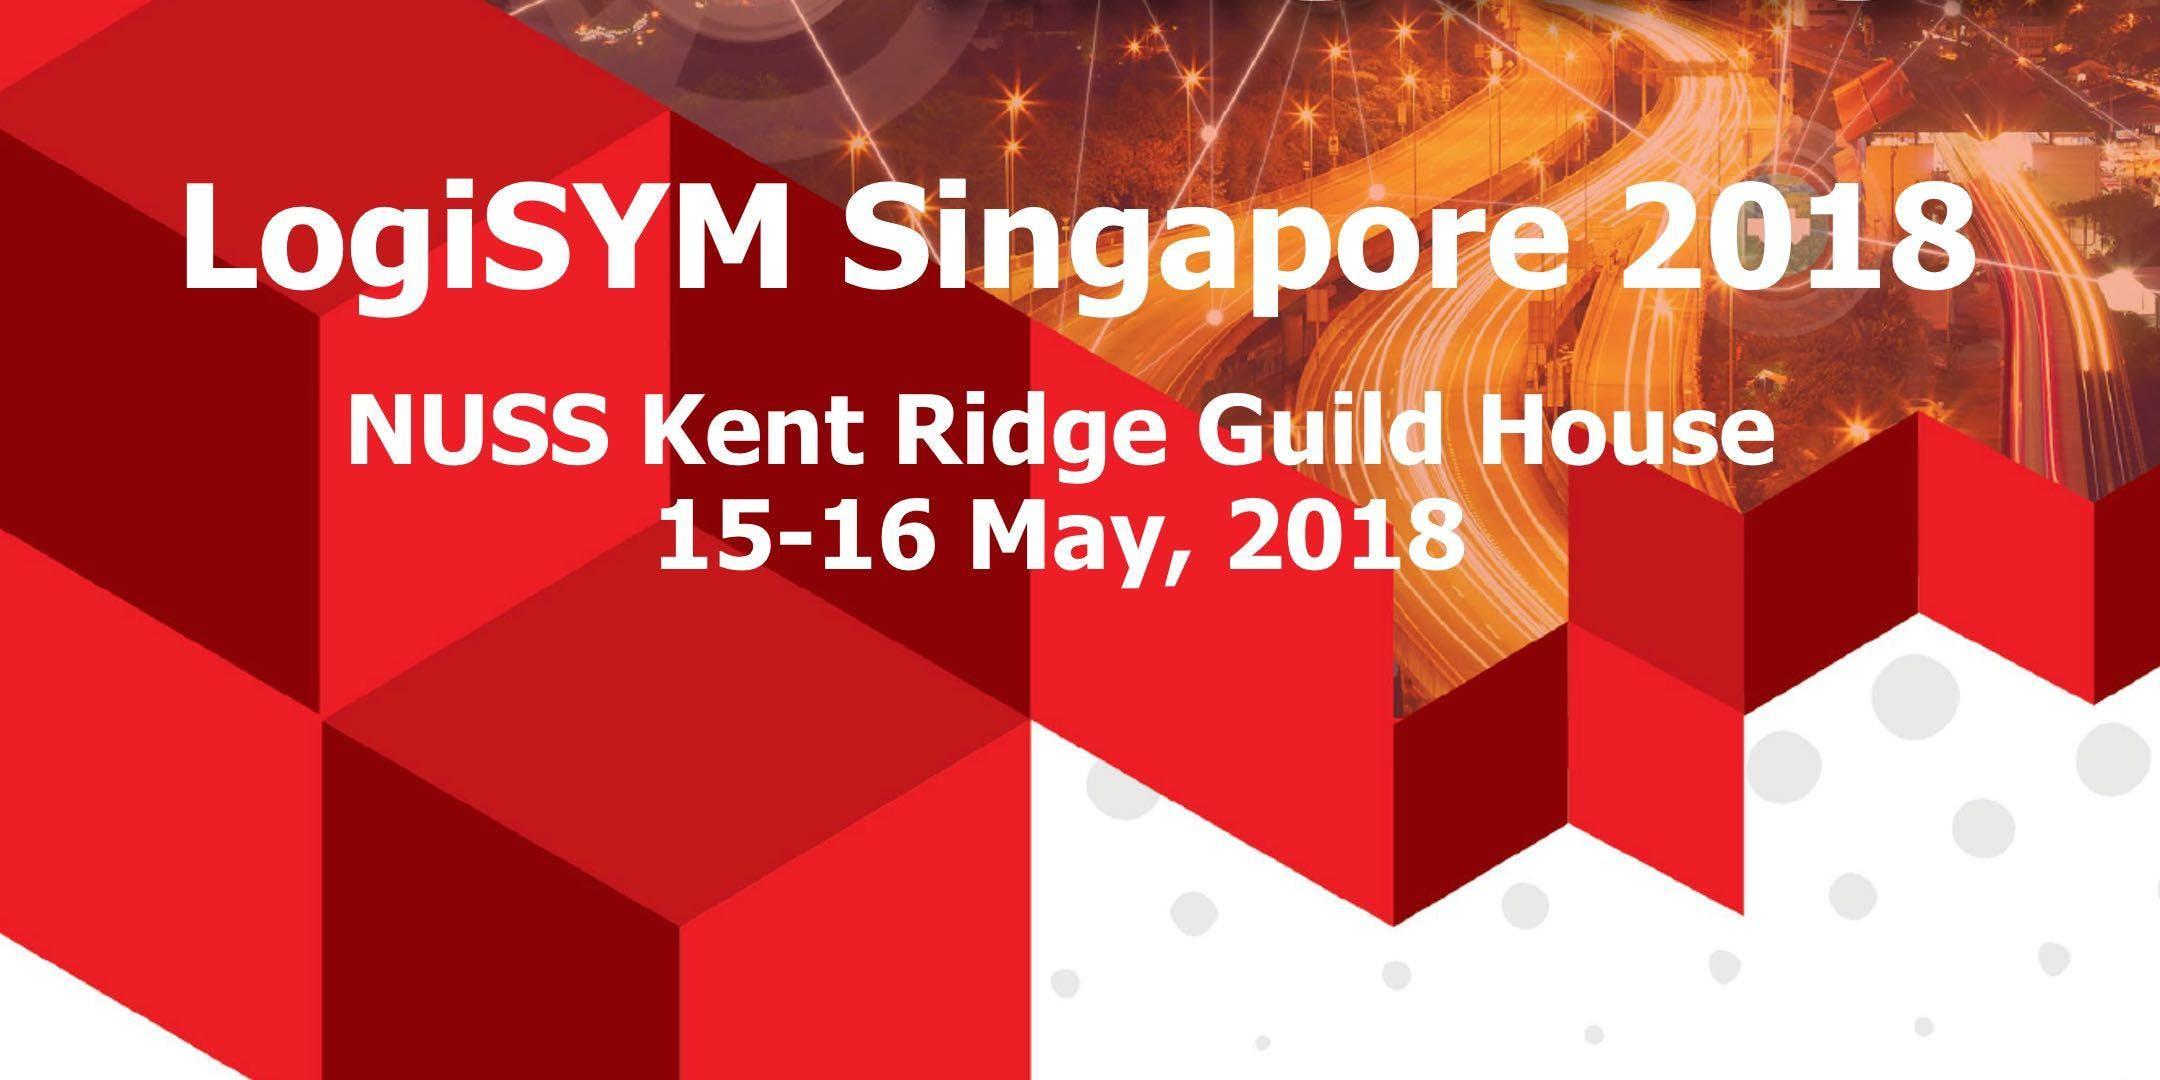 LogiSYM Singapore 2018